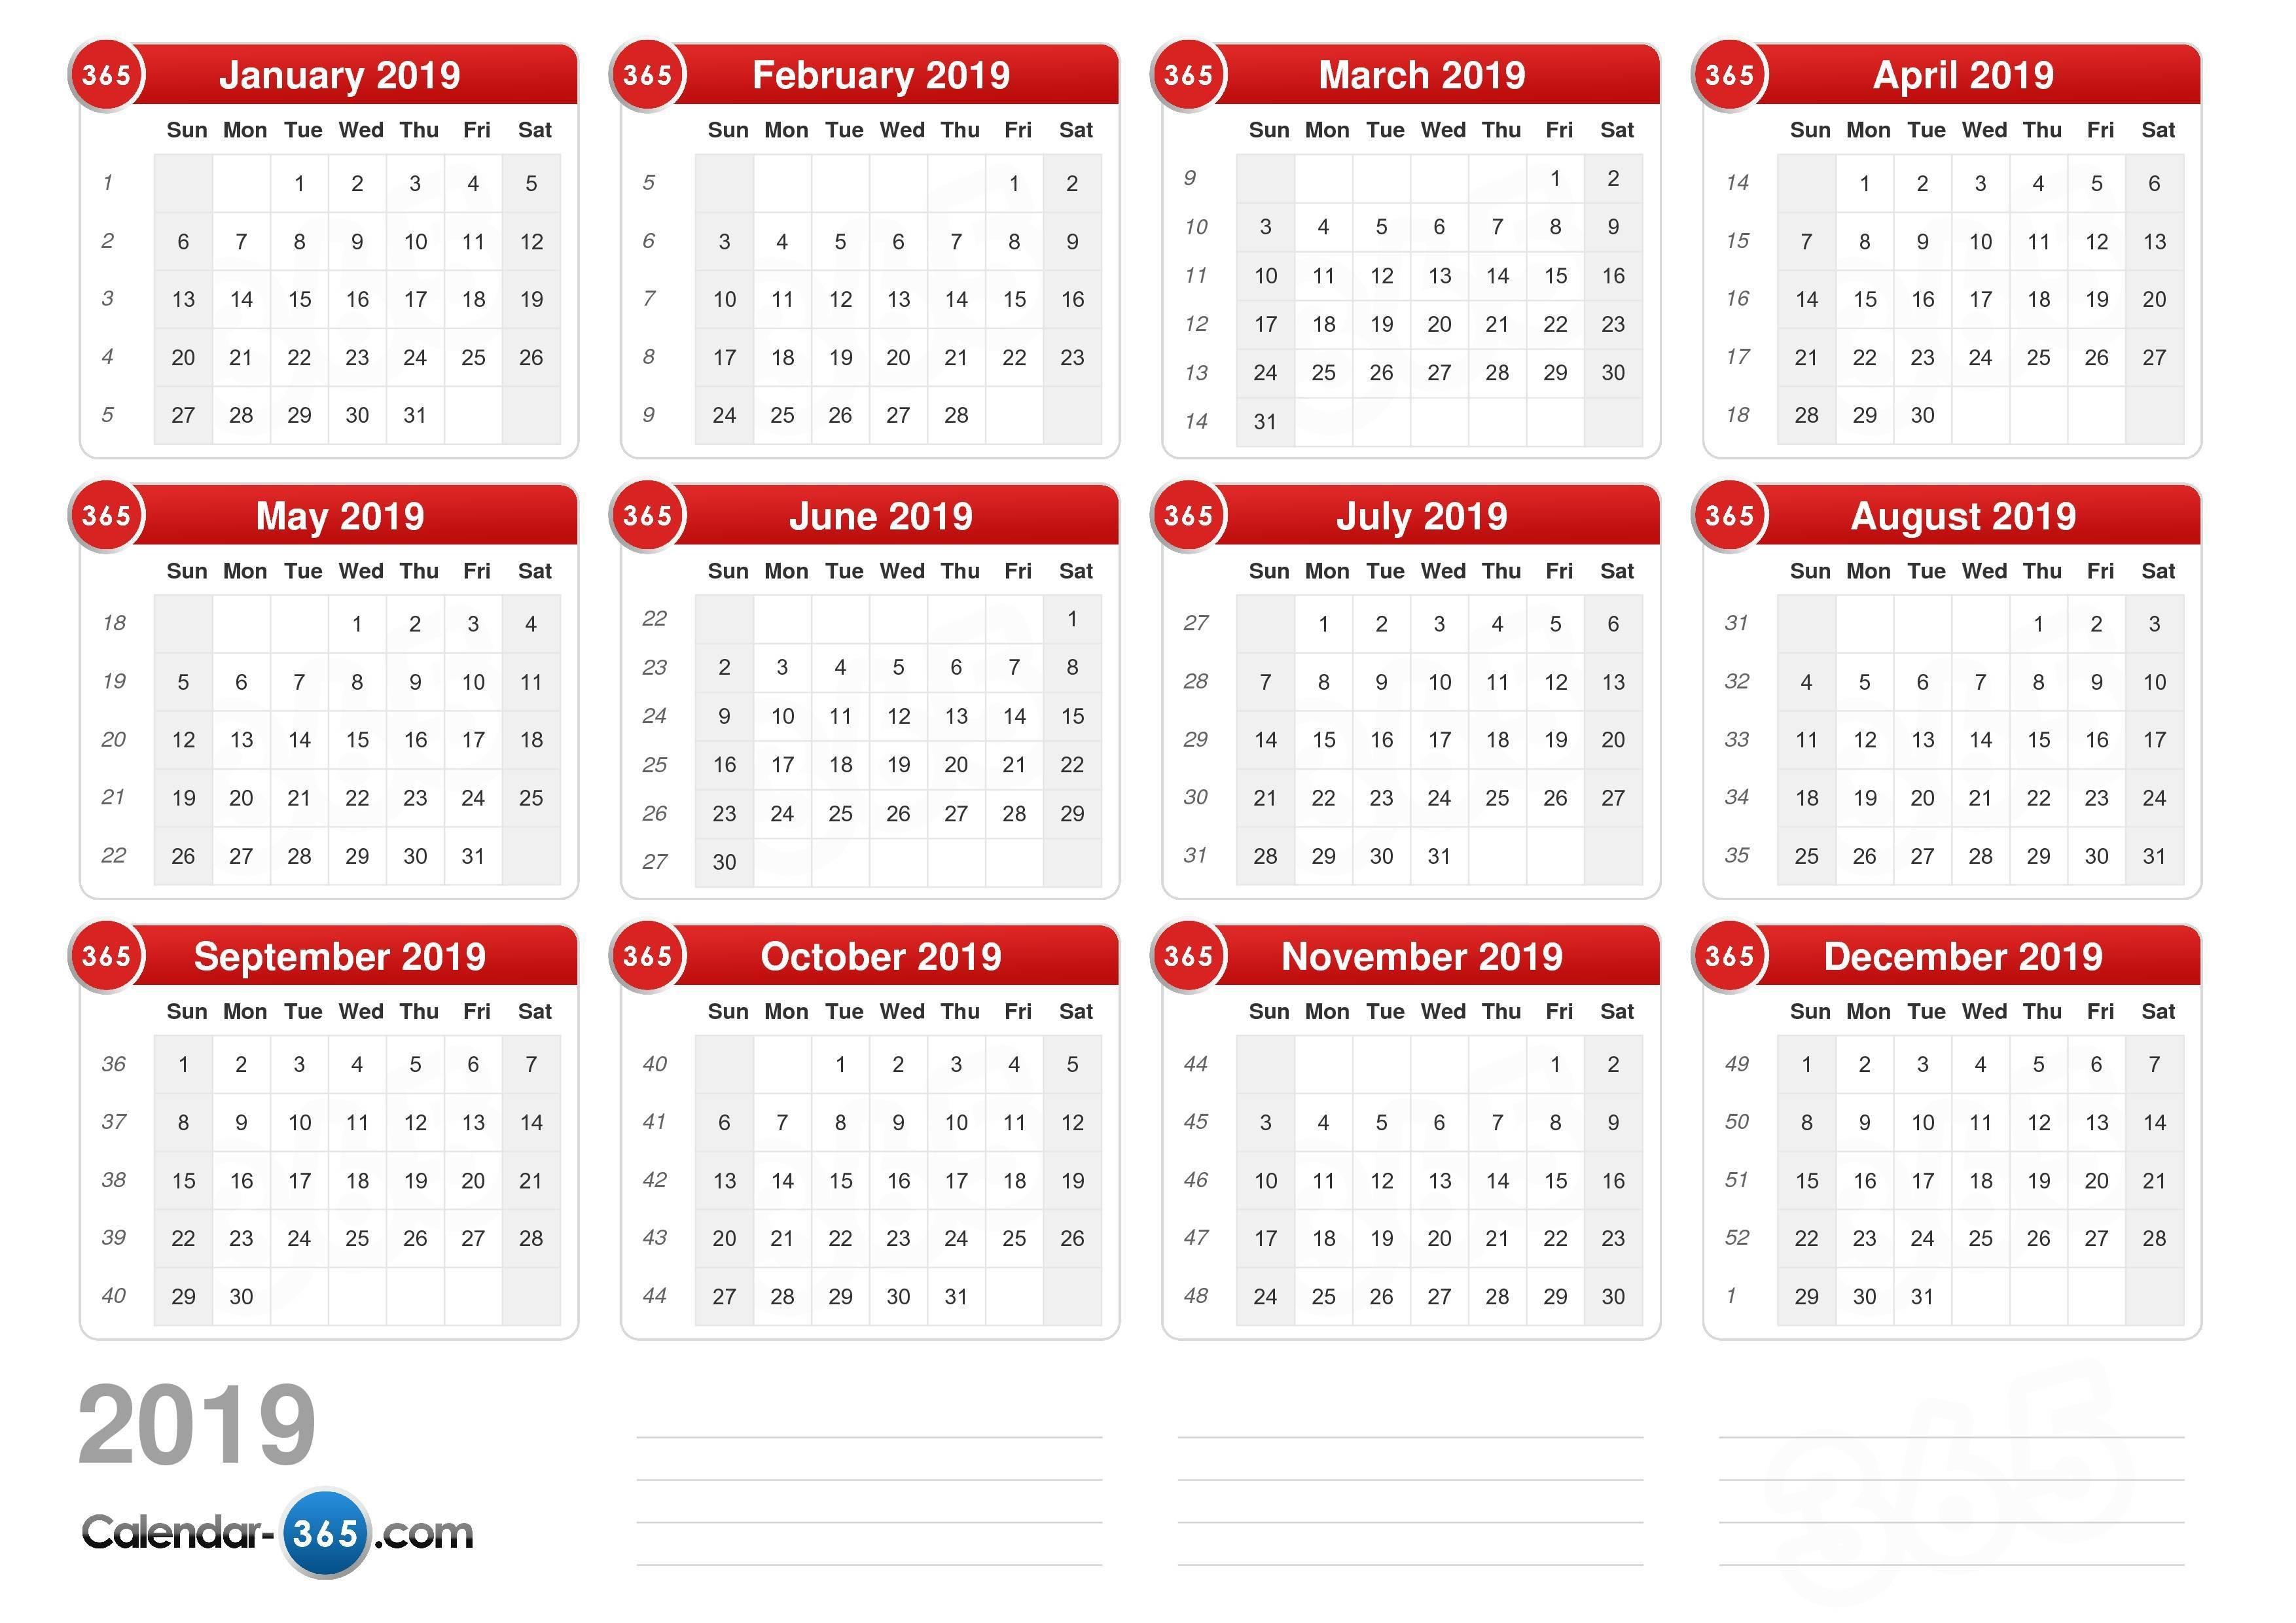 2019 Calendar Calendar 2019 Images